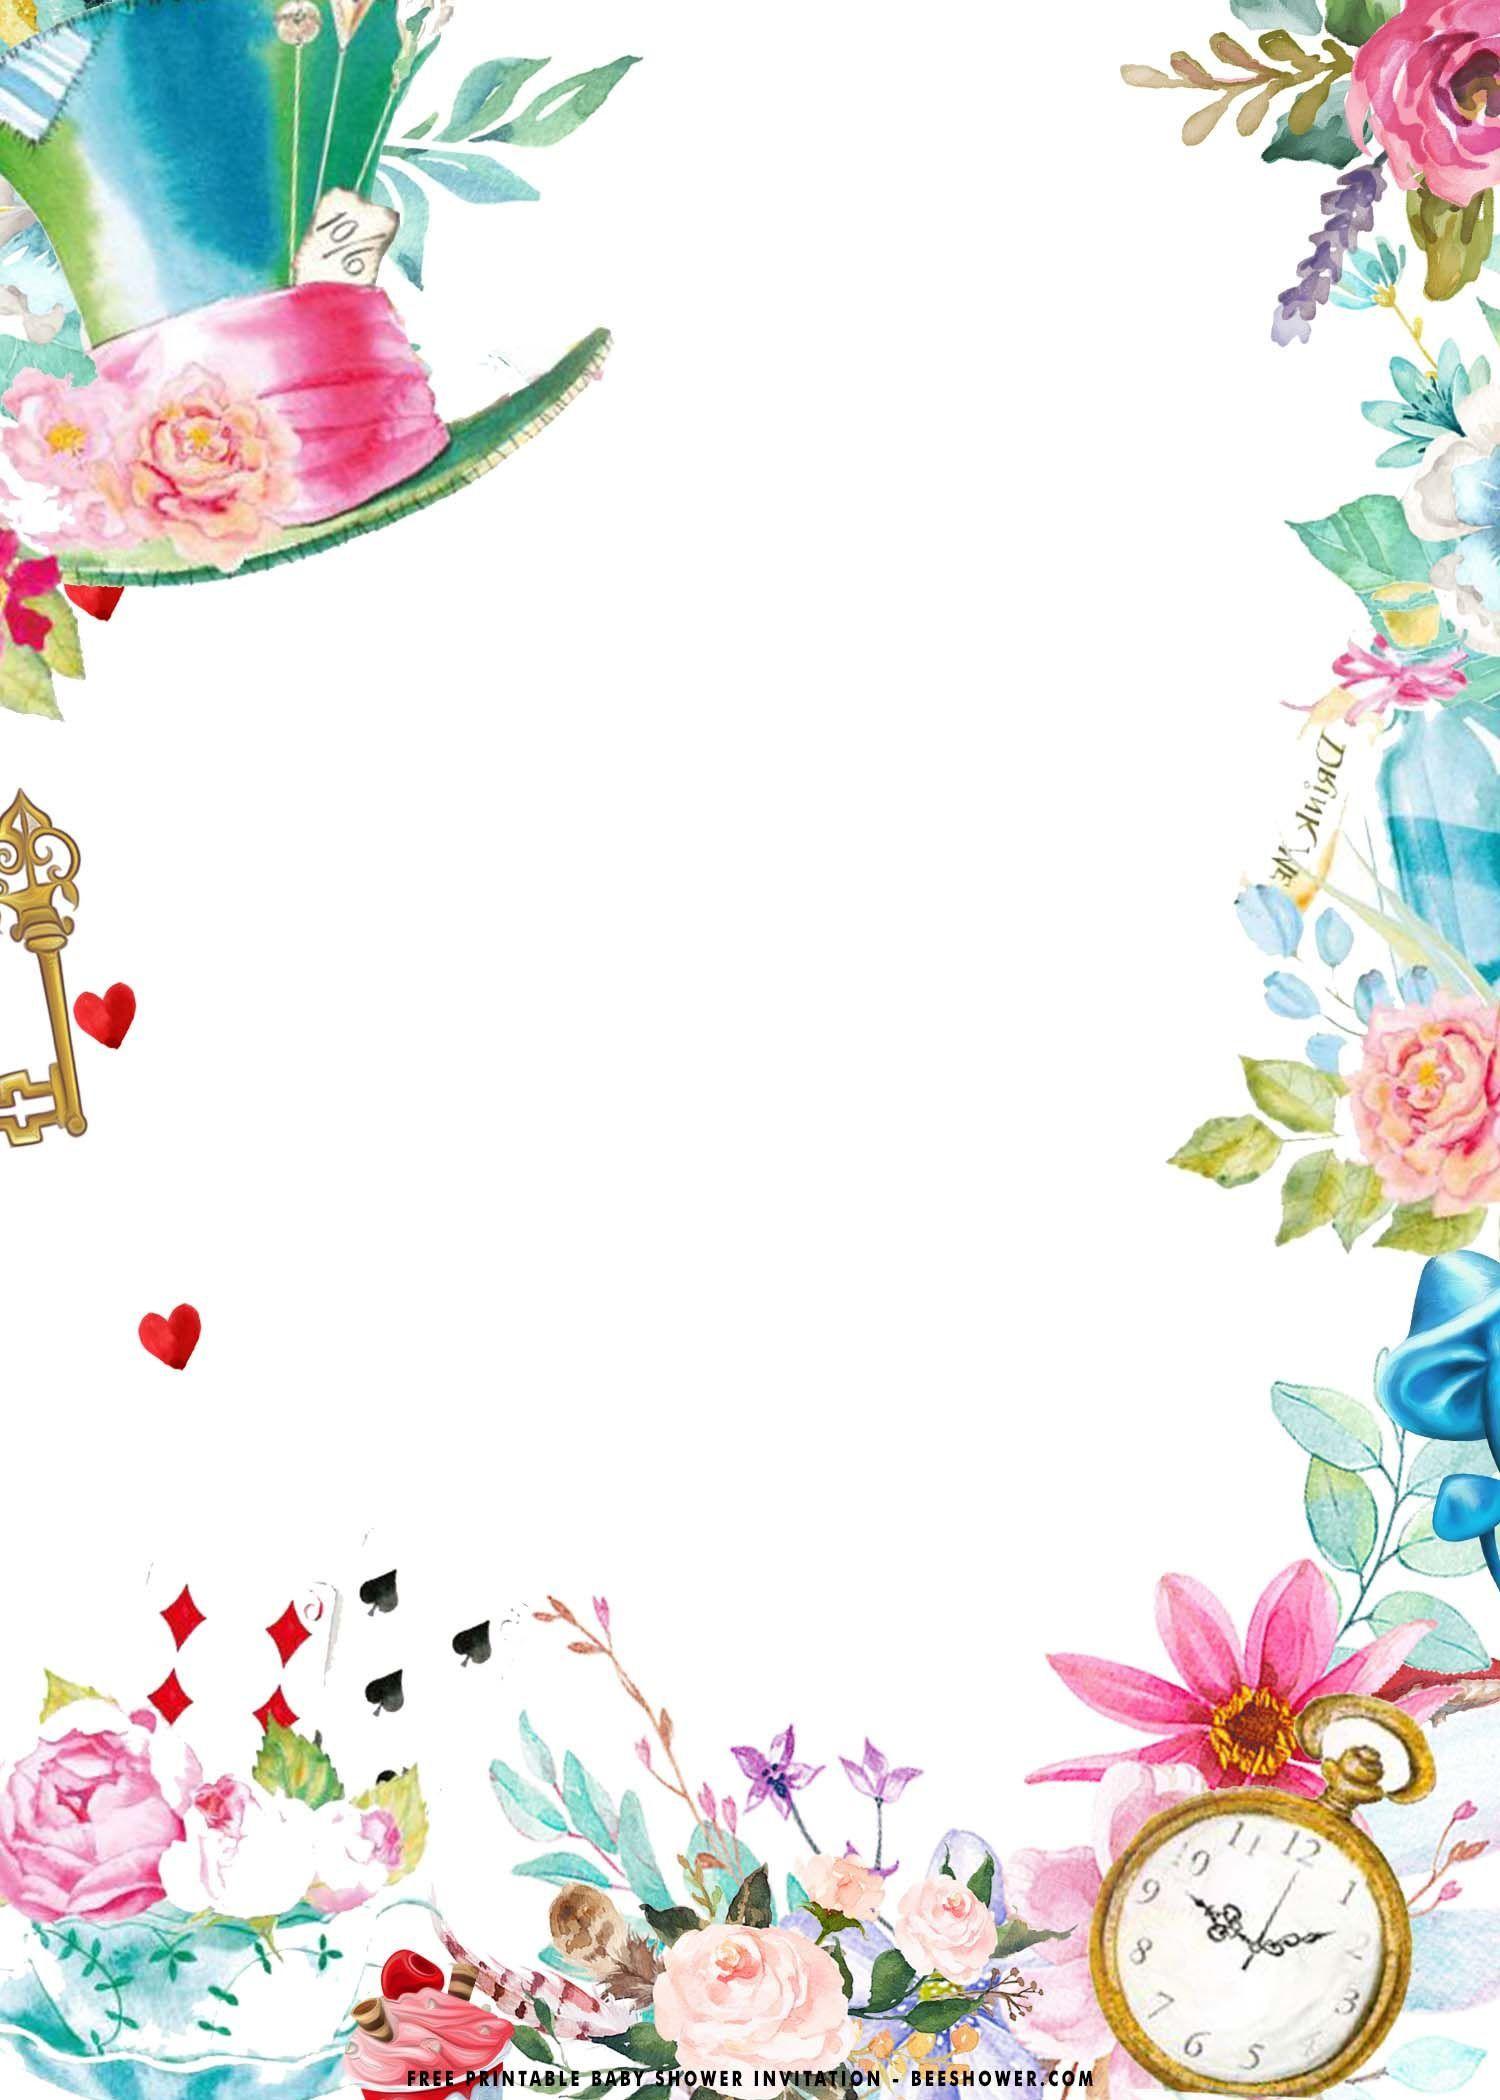 002 Impressive Alice In Wonderland Tea Party Template High Definition  Templates Invitation FreeFull